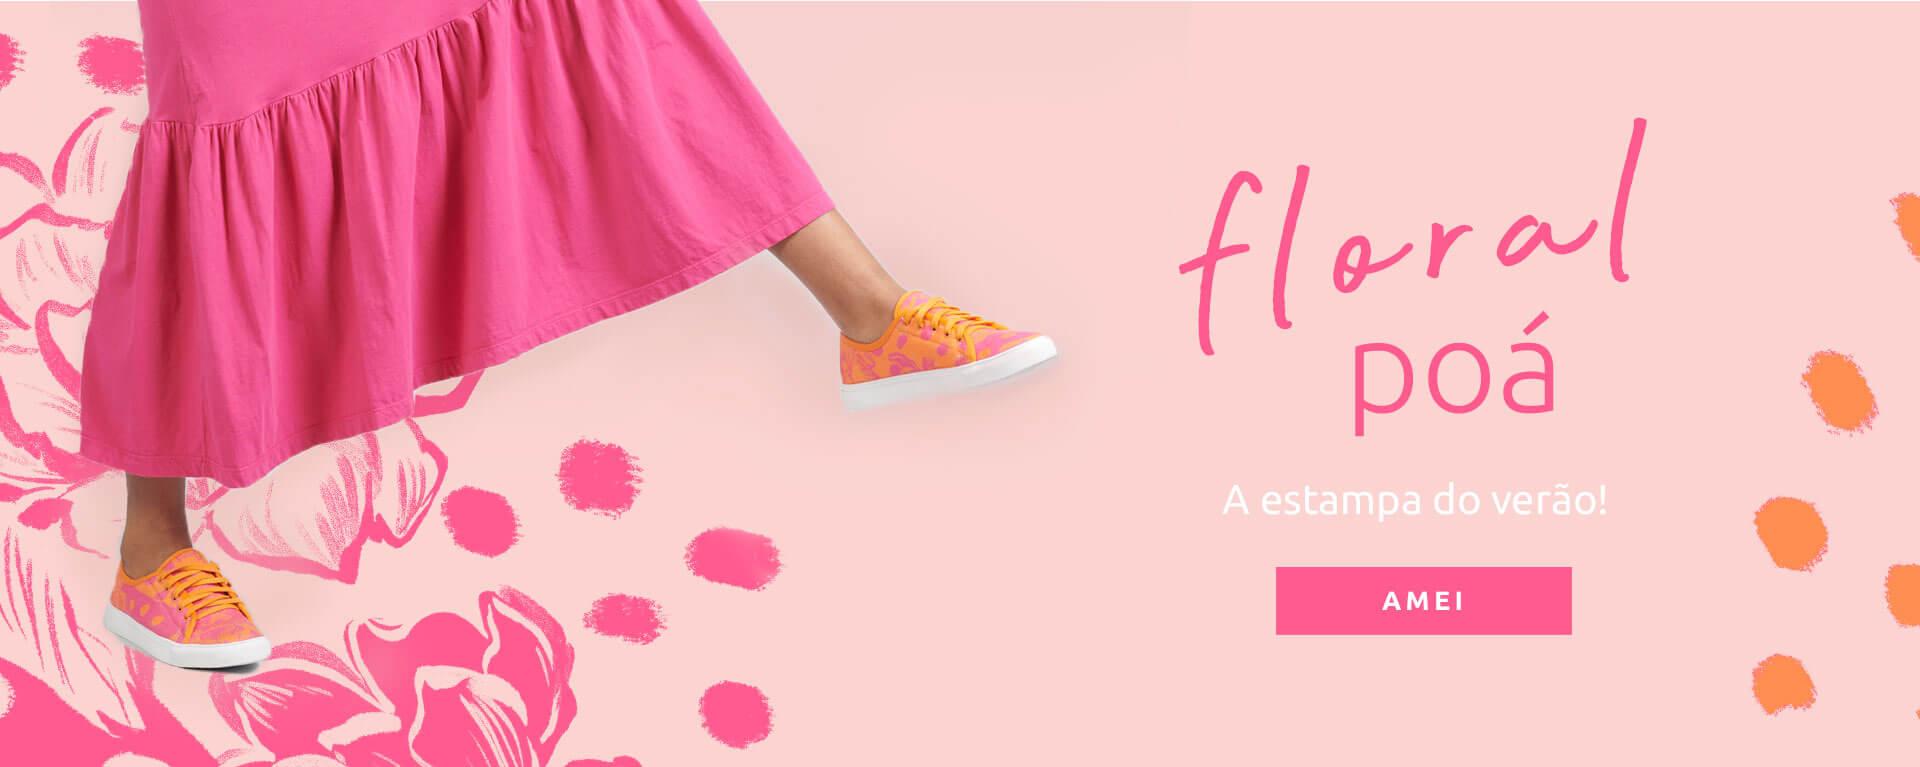 Banner- floral-poa